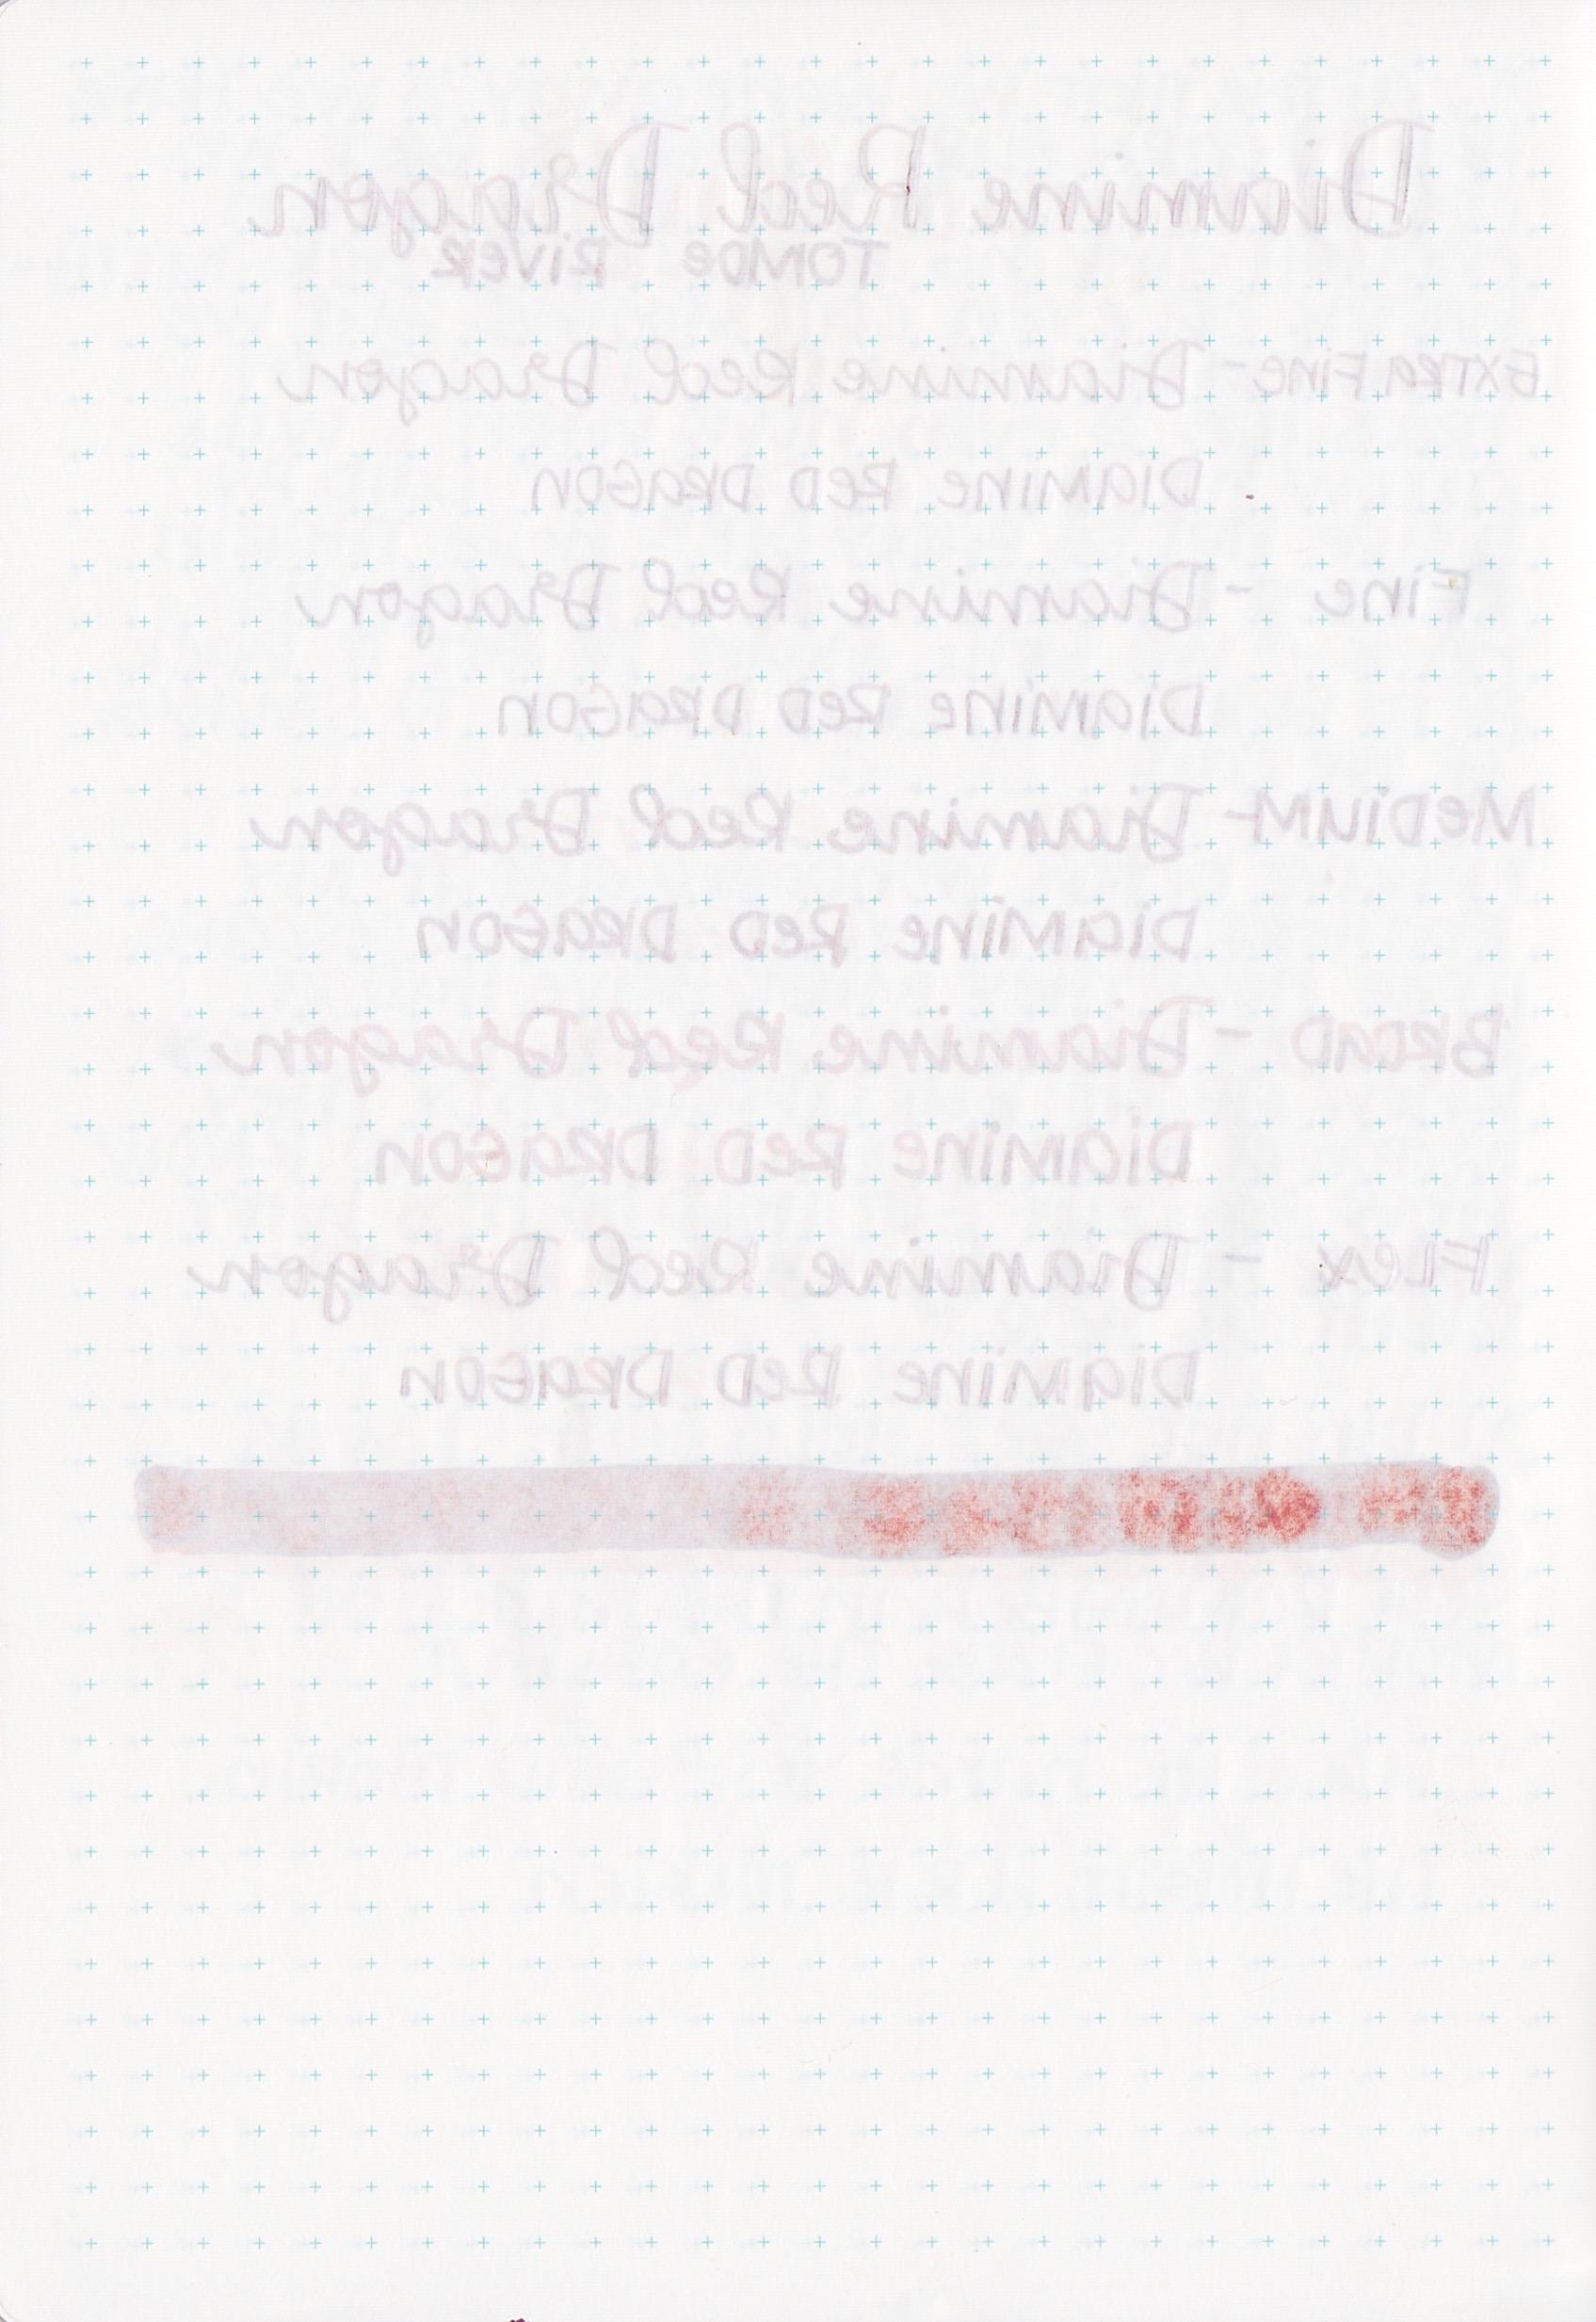 DRedDragon - 9.jpg